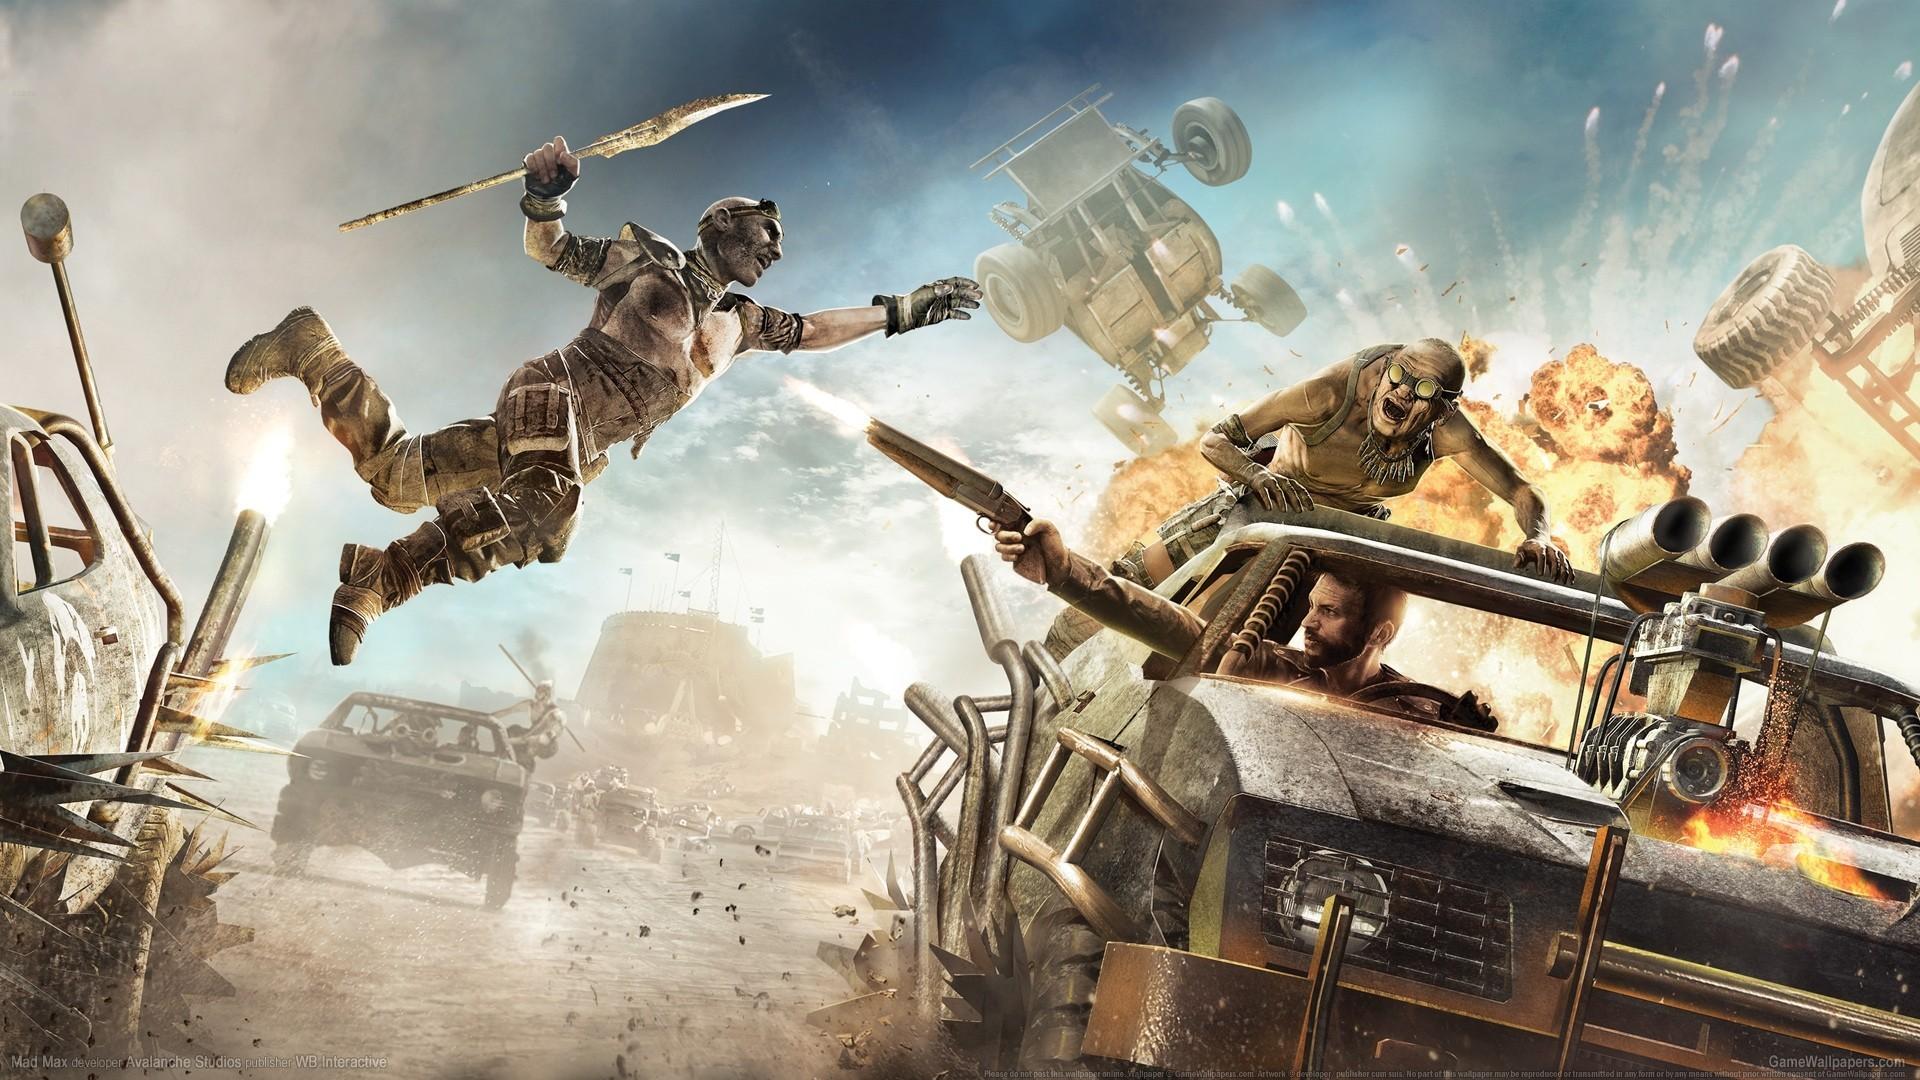 Wallpaper Soldier Mythology Mad Max Mad Max Game Screenshot